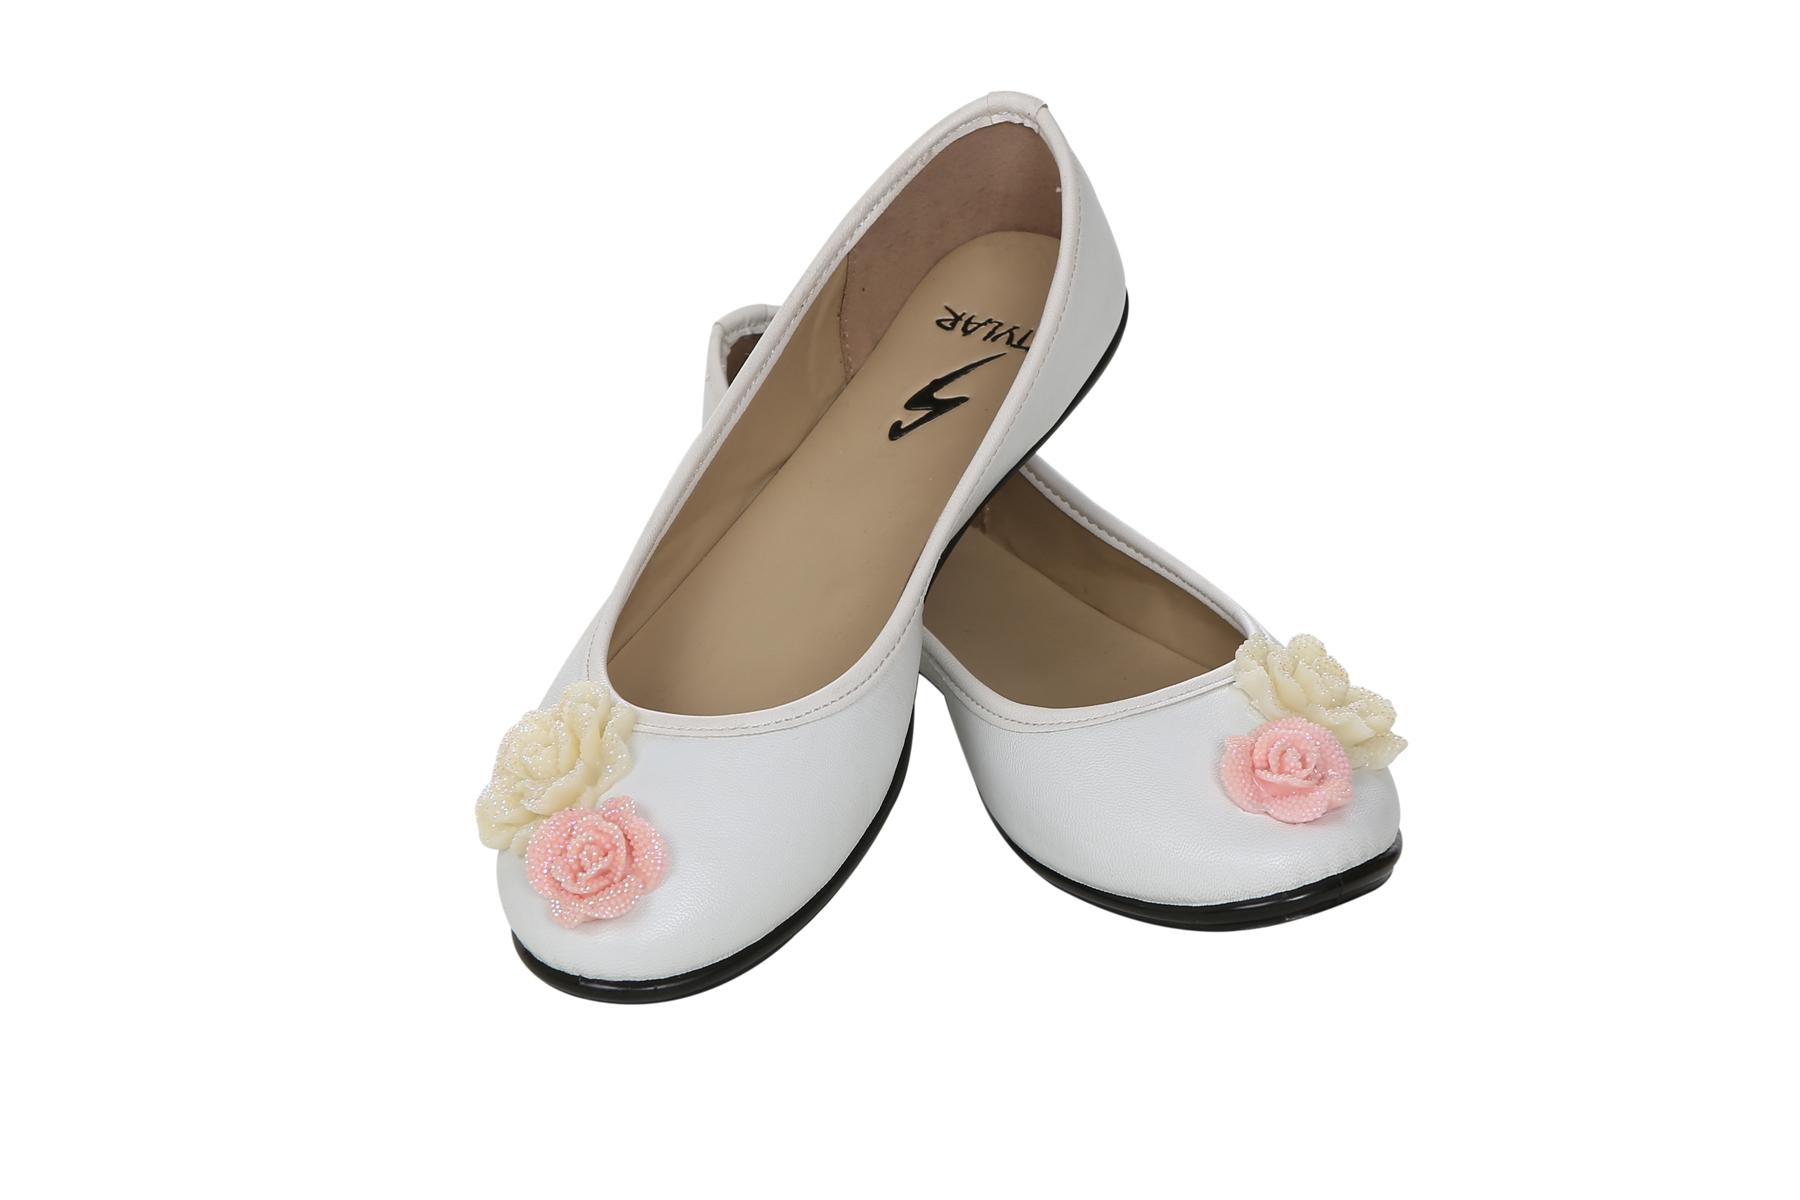 STYLAR - Best Footwear Manufacturers in Delhi